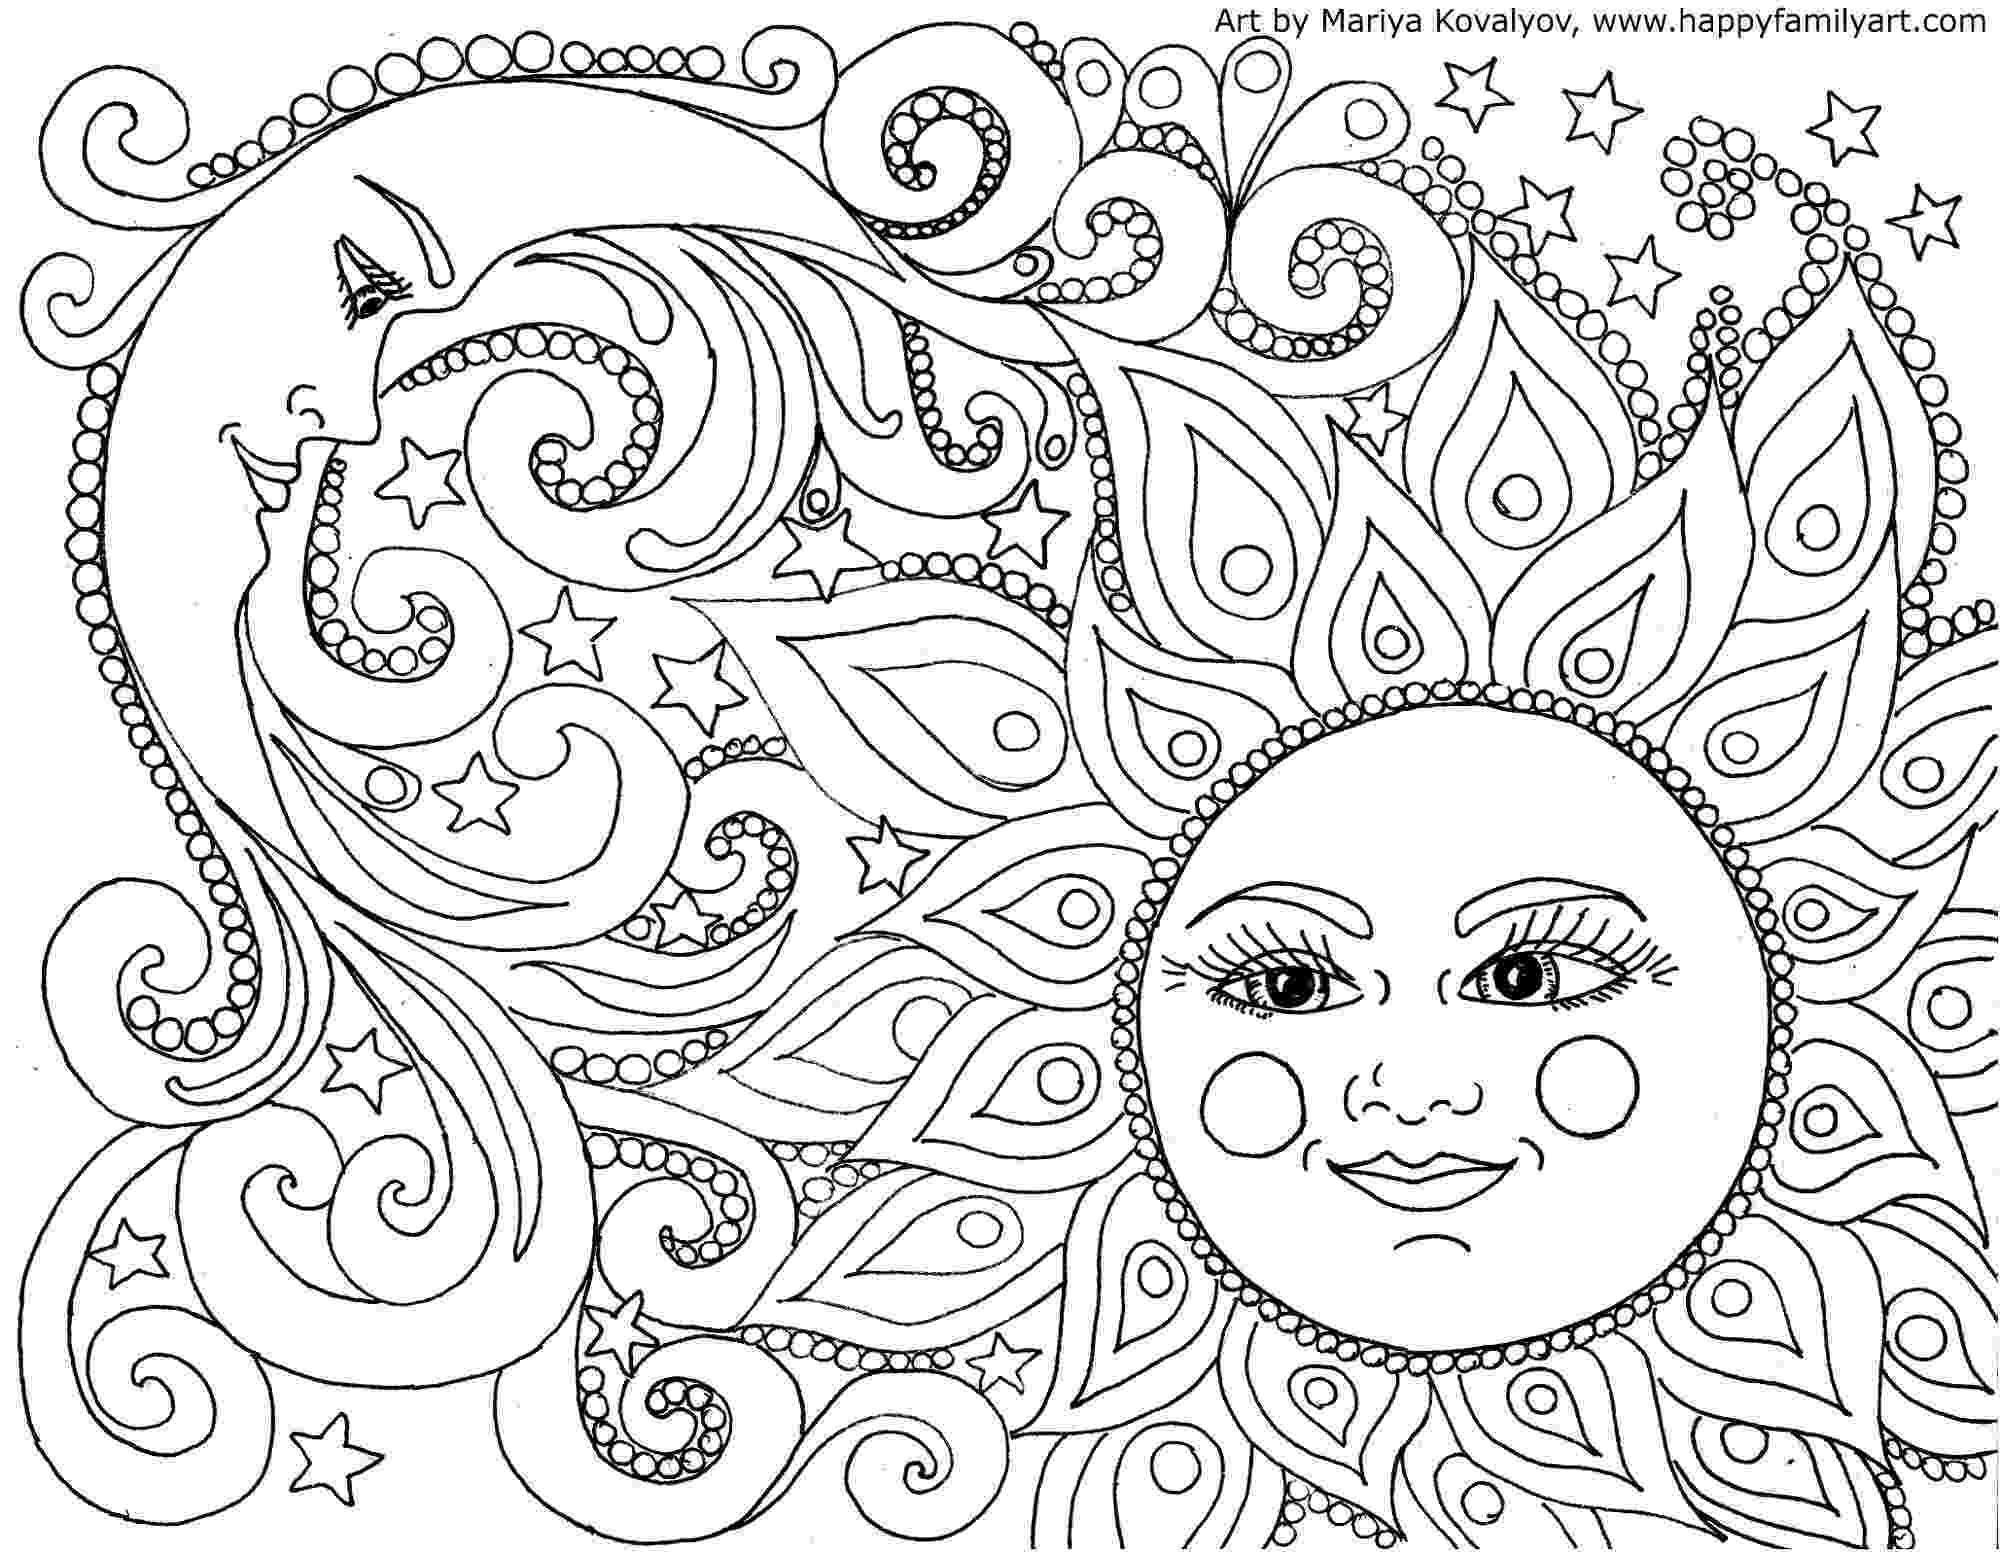 coloring mandalas free printable 22 free mandala coloring pages pdf collection coloring mandalas free coloring printable